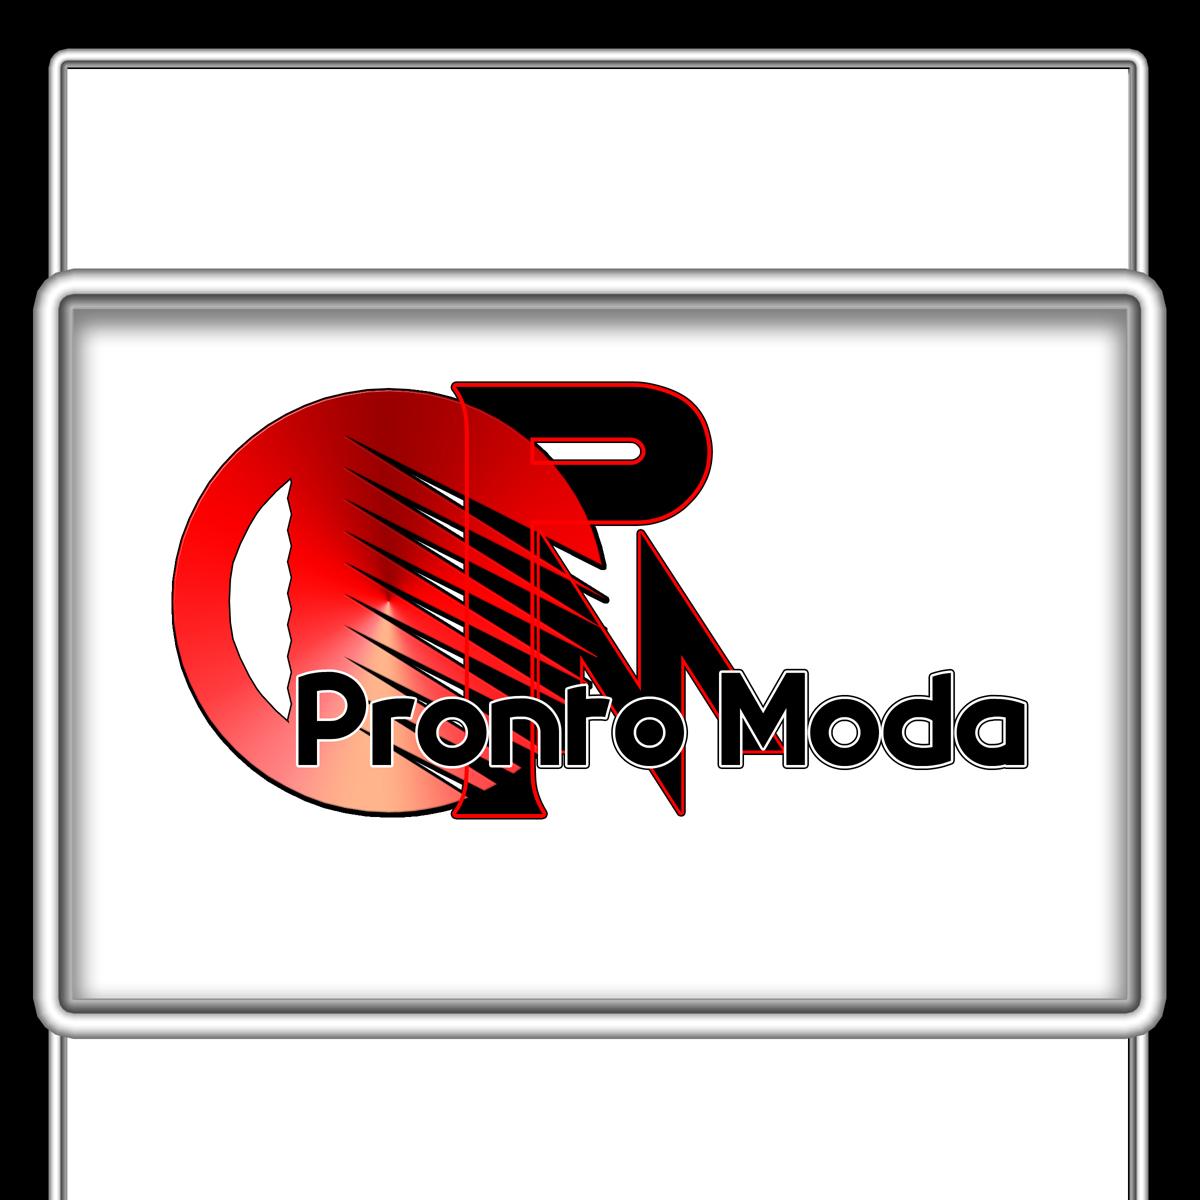 Logo Design by MITUCA ANDREI - Entry No. 29 in the Logo Design Contest Captivating Logo Design for Pronto moda.